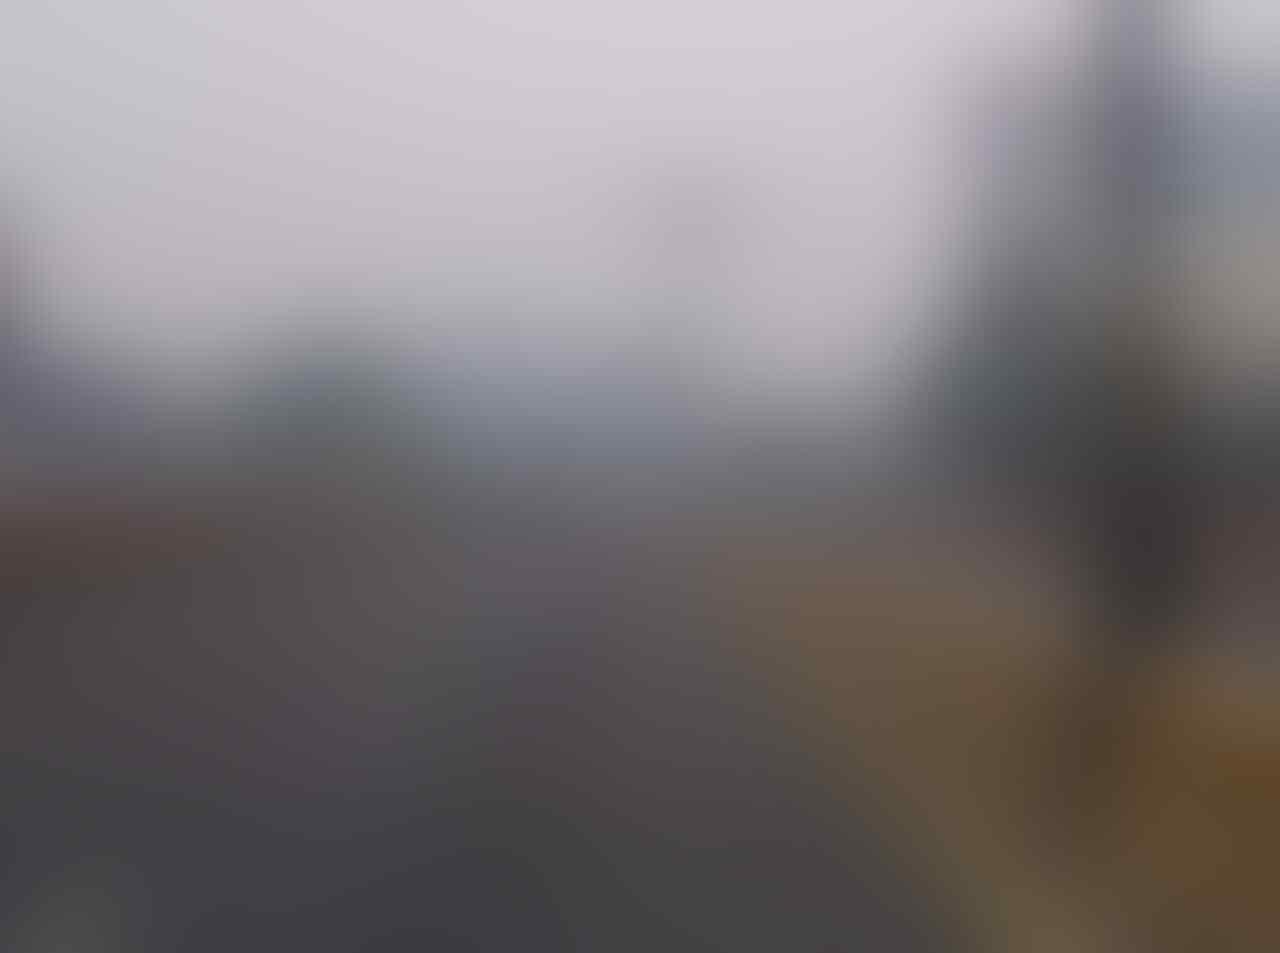 [share] foto kabut asap R3